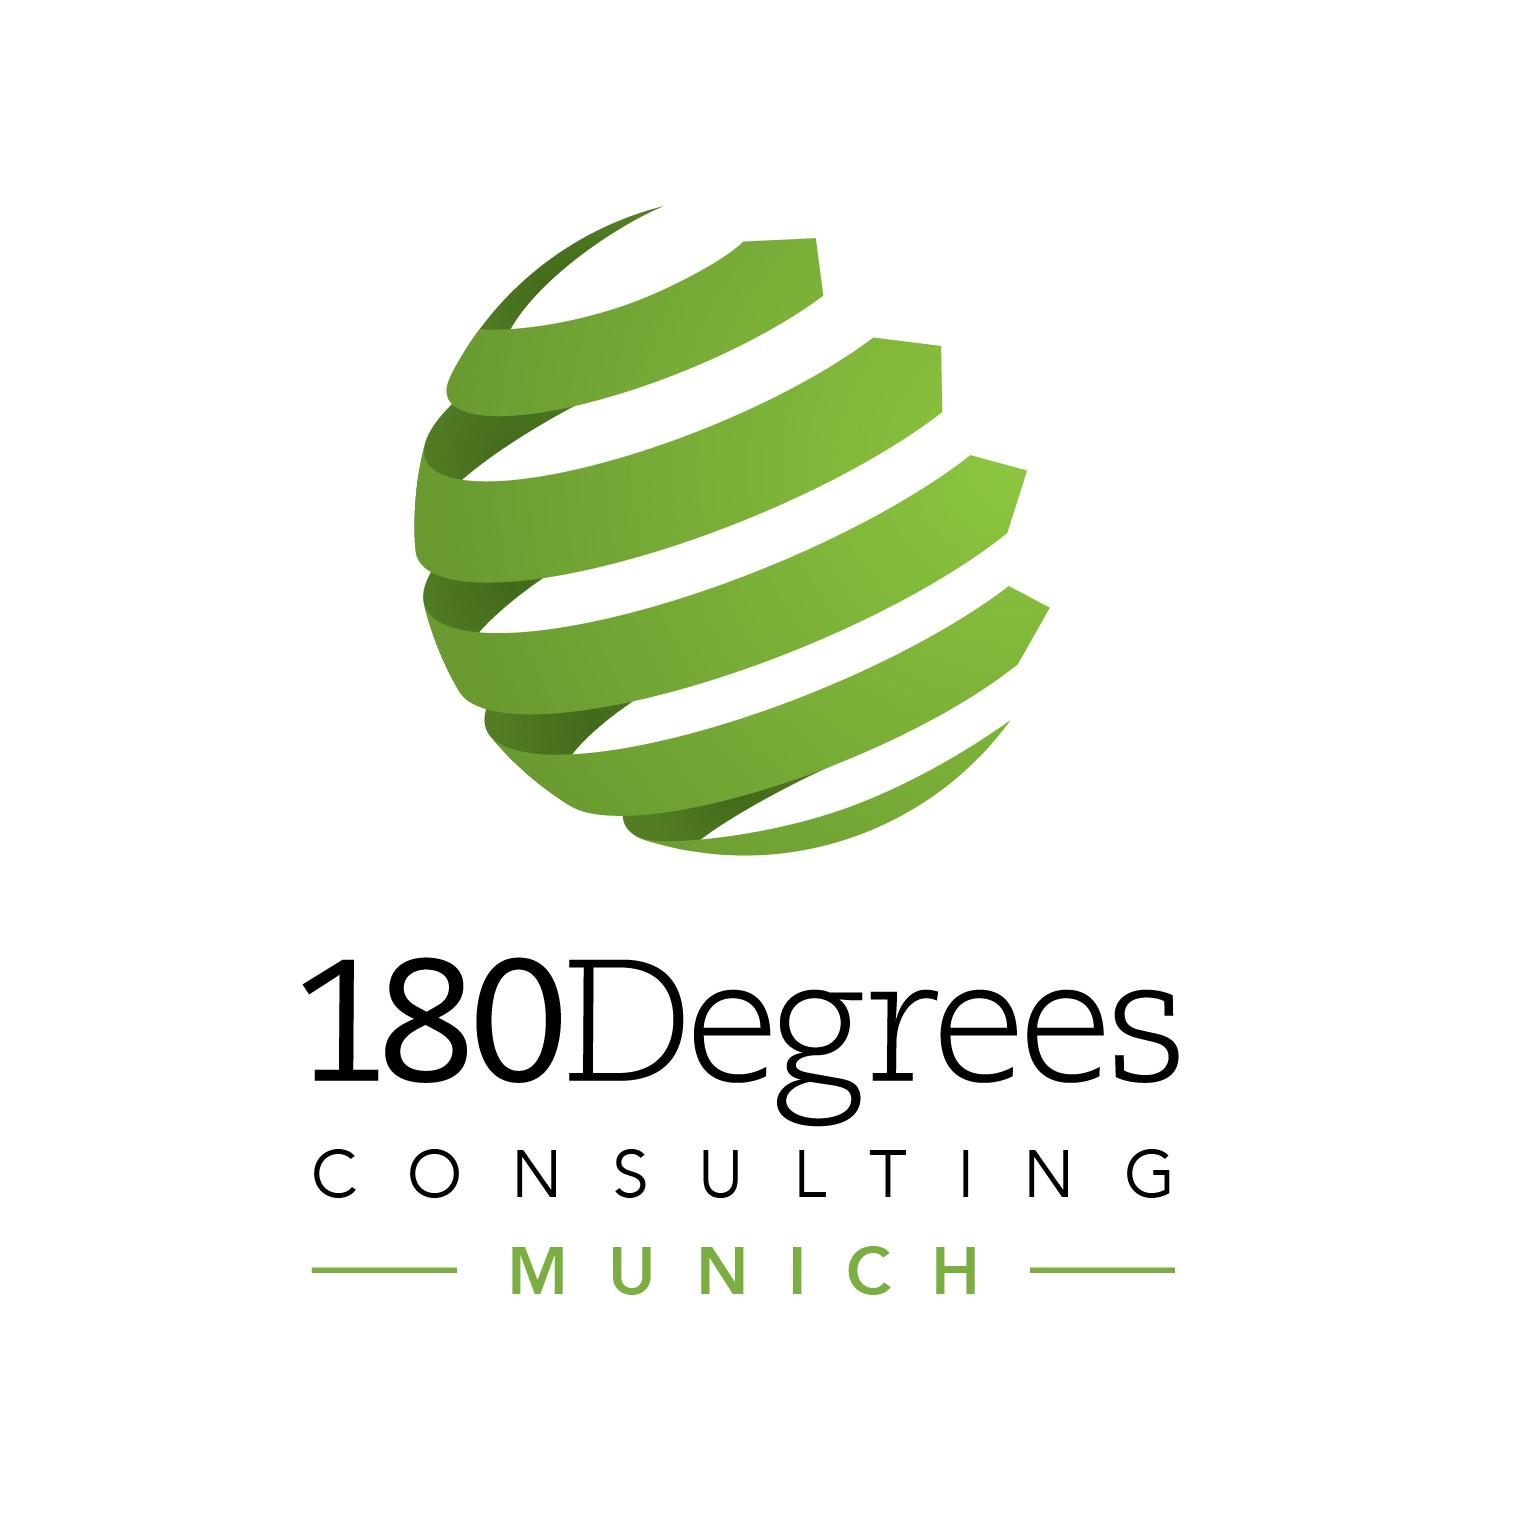 180 DC munich logo